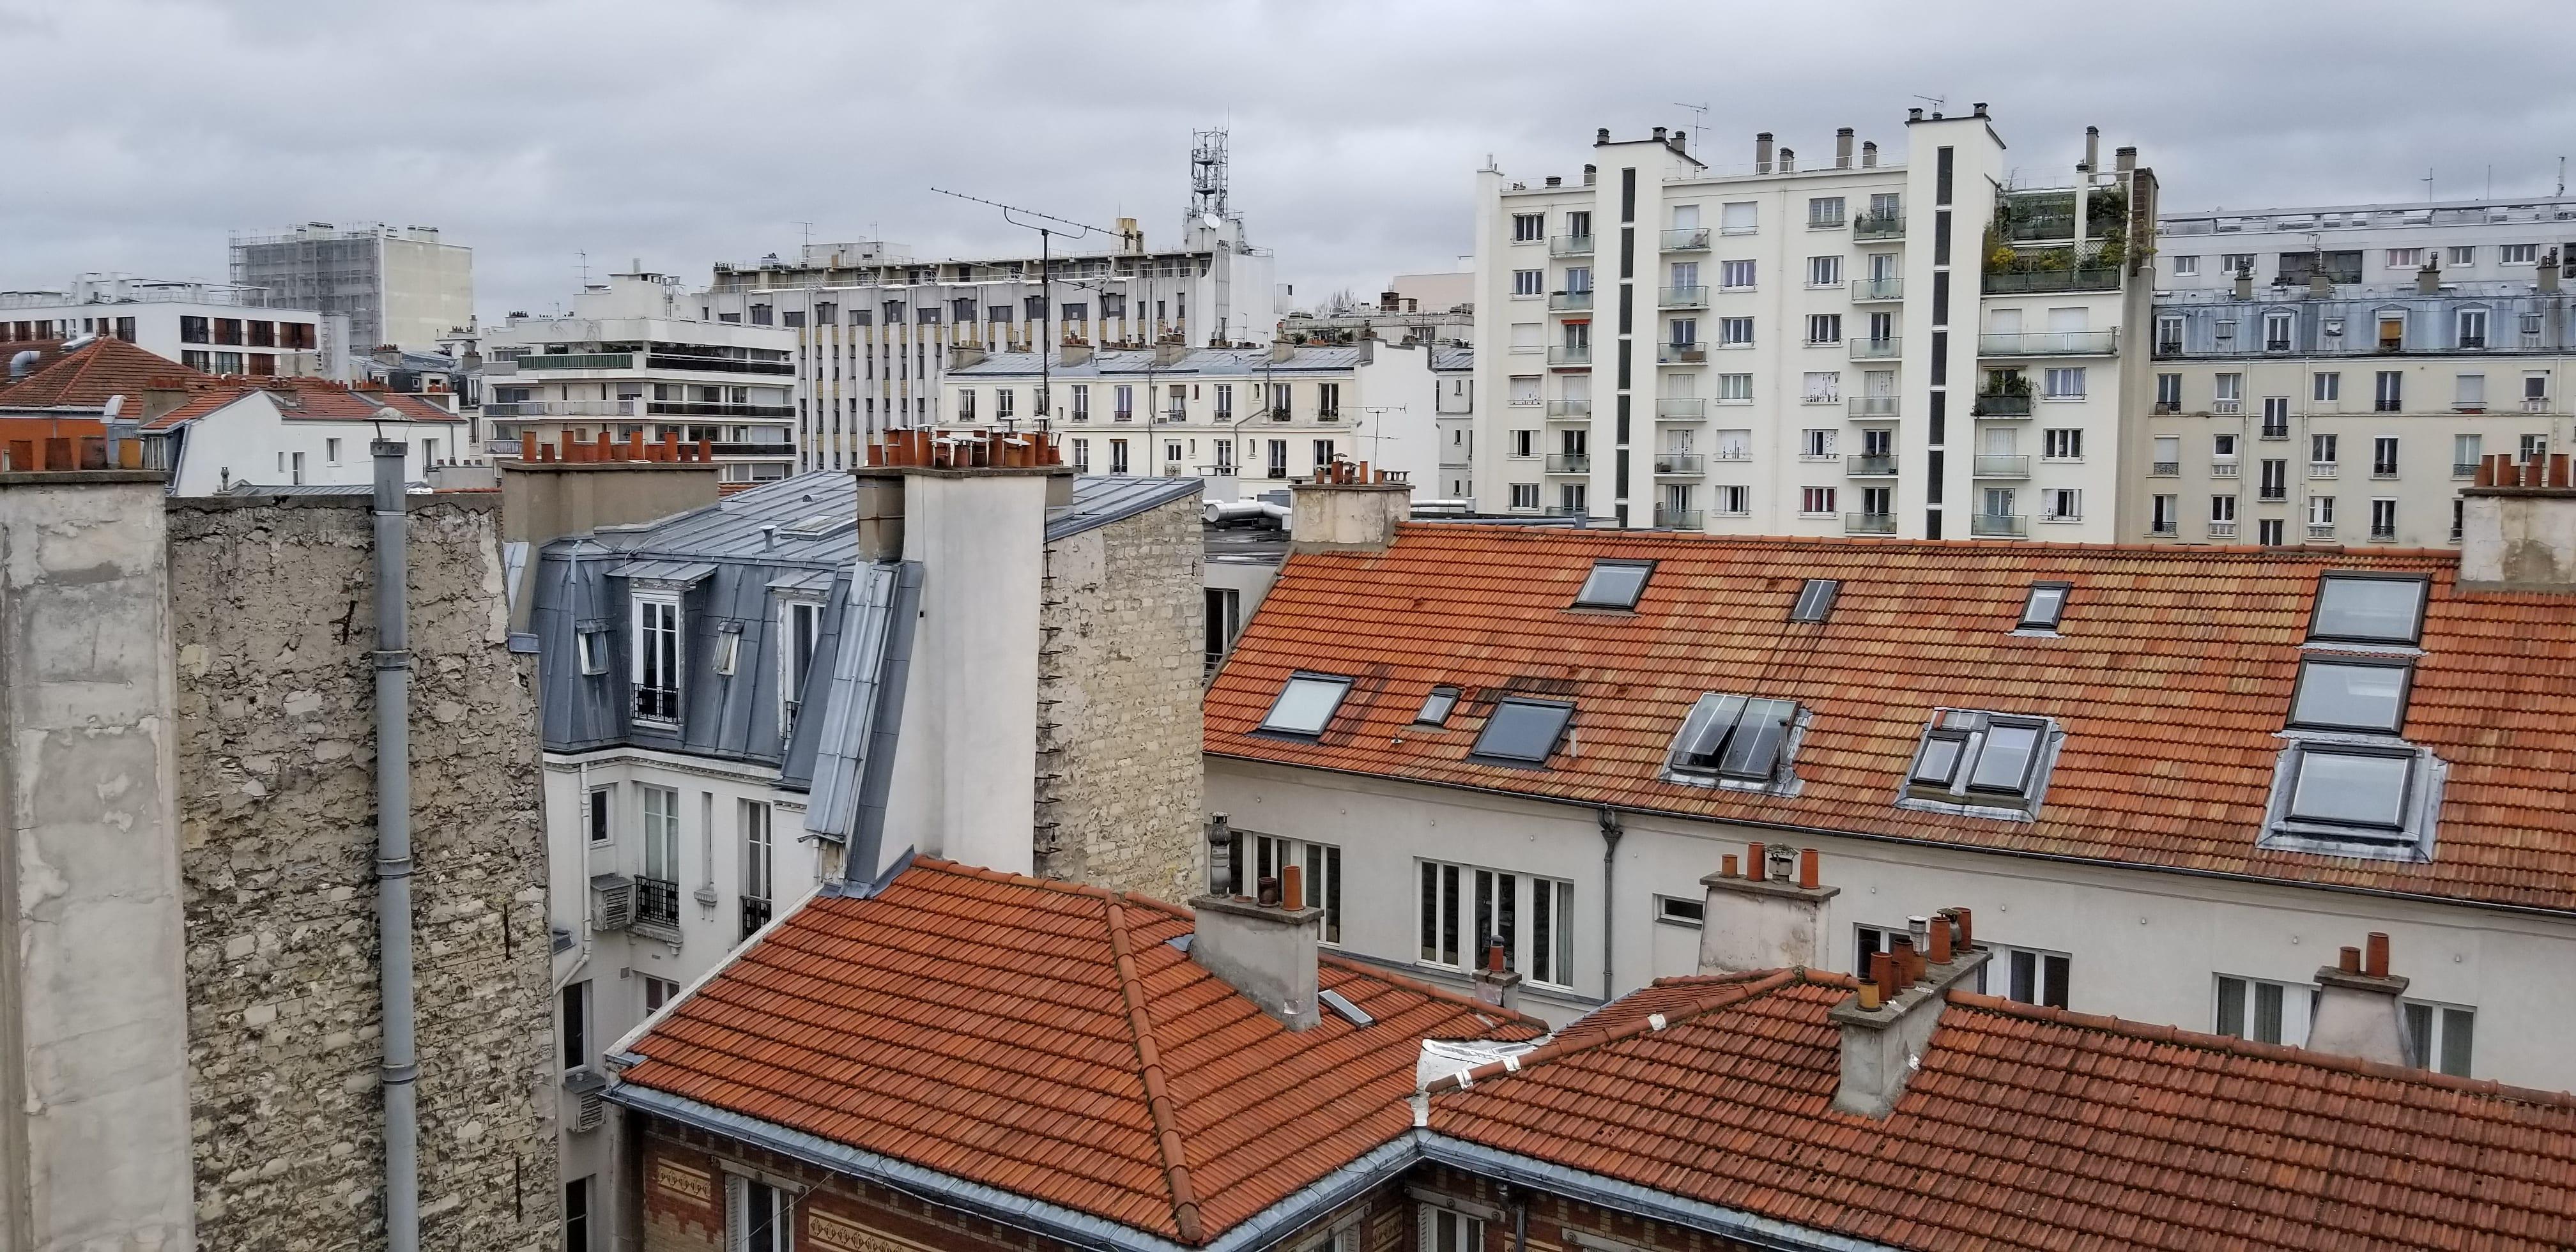 Last Minute Basics: Paris